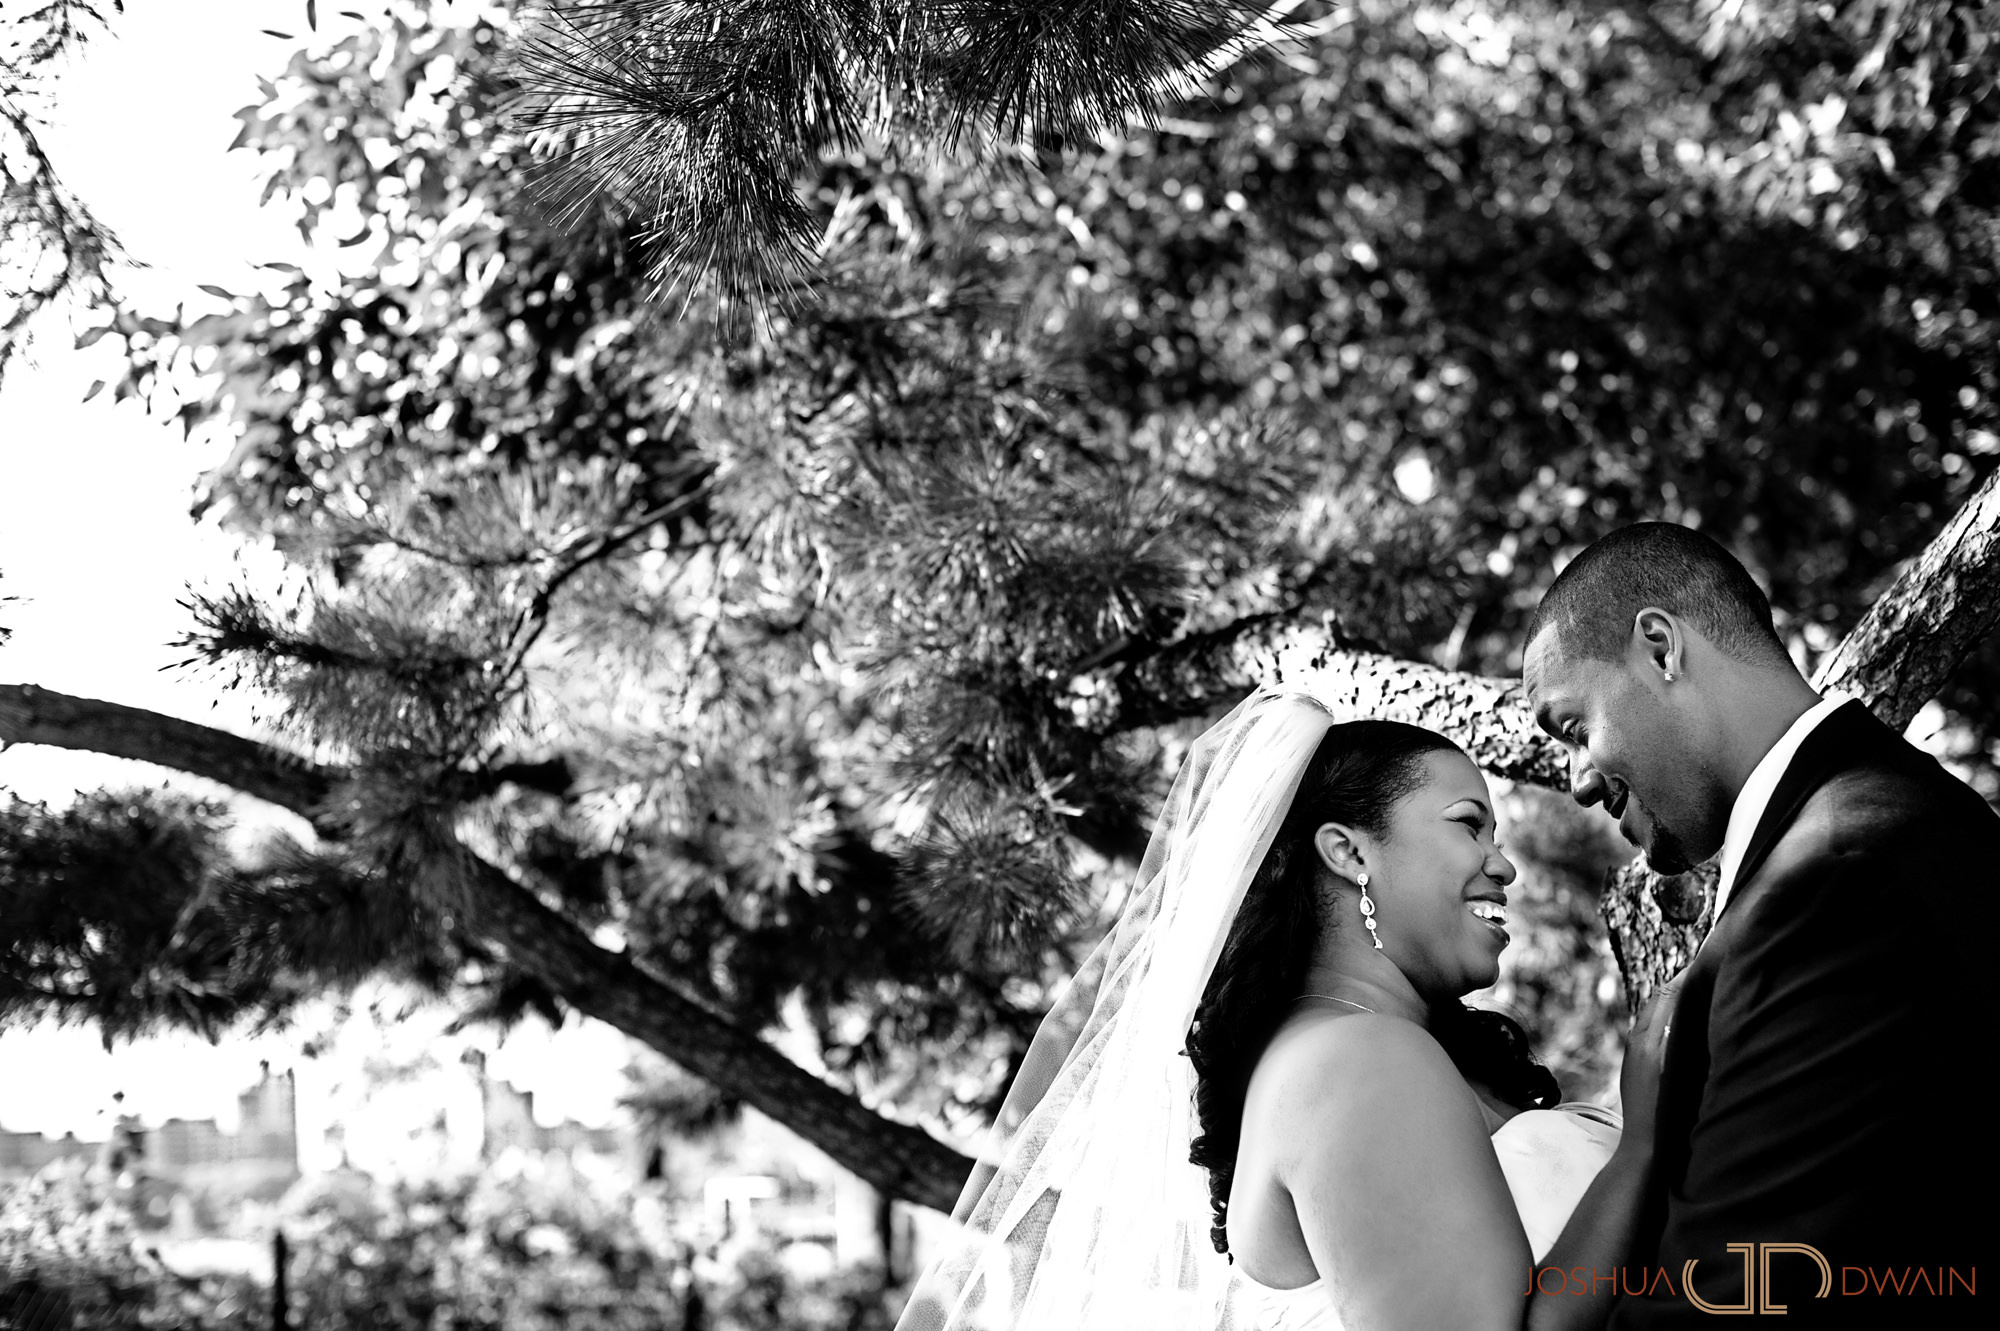 jessica-frank-012-giando-on-the-water-brooklyn-ny-wedding-photographer-joshua-dwain-2011-09-02_jf_247